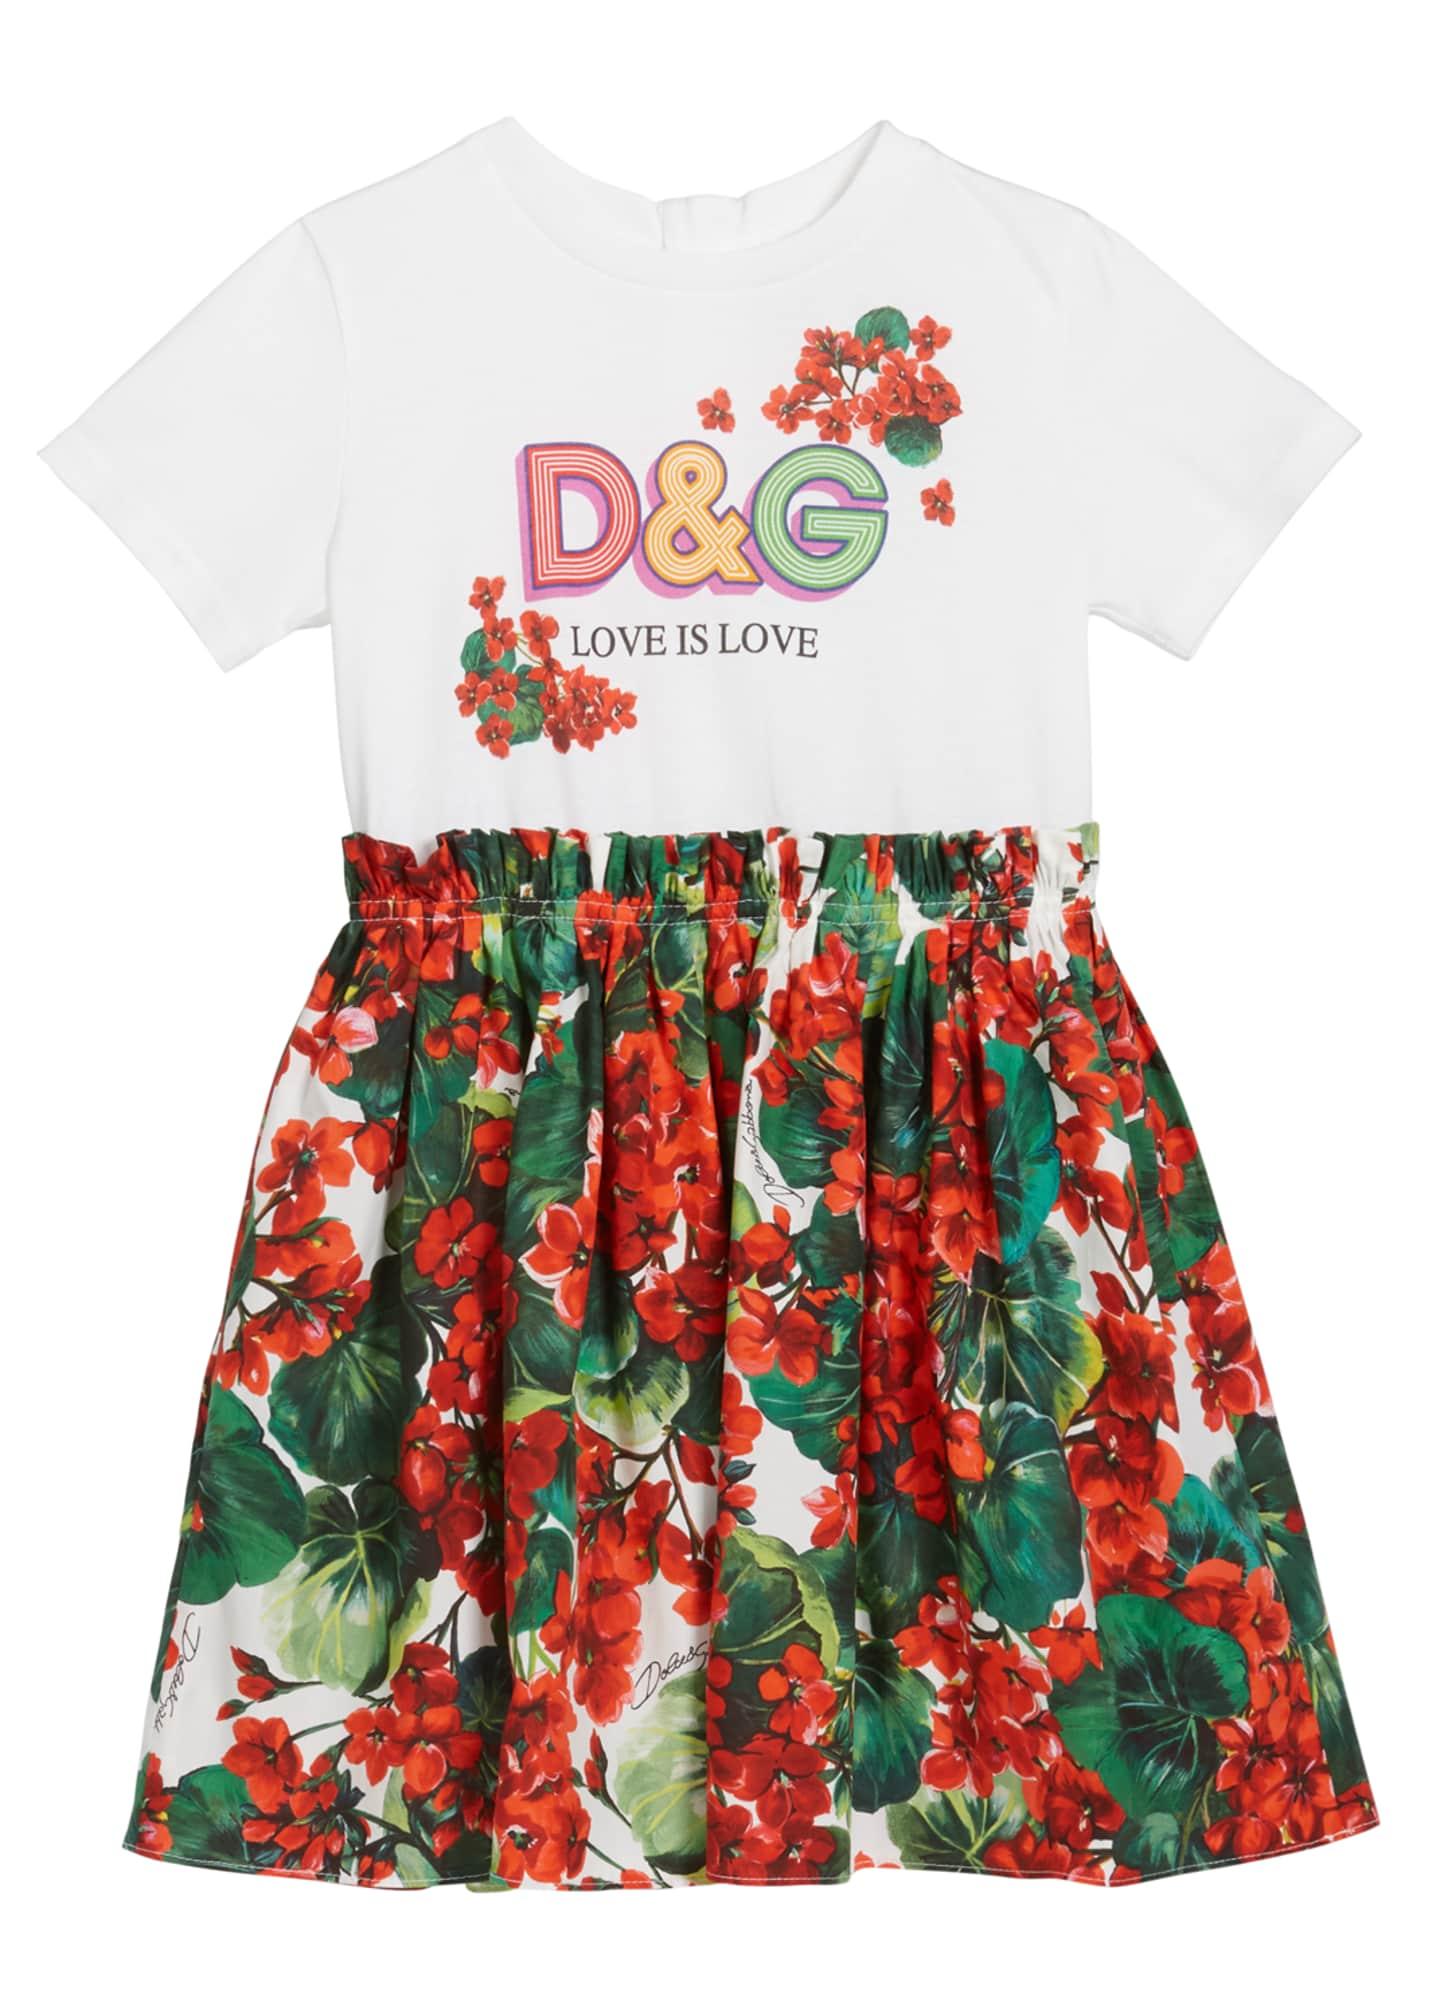 Dolce & Gabbana Girl's DG T-Shirt & Floral